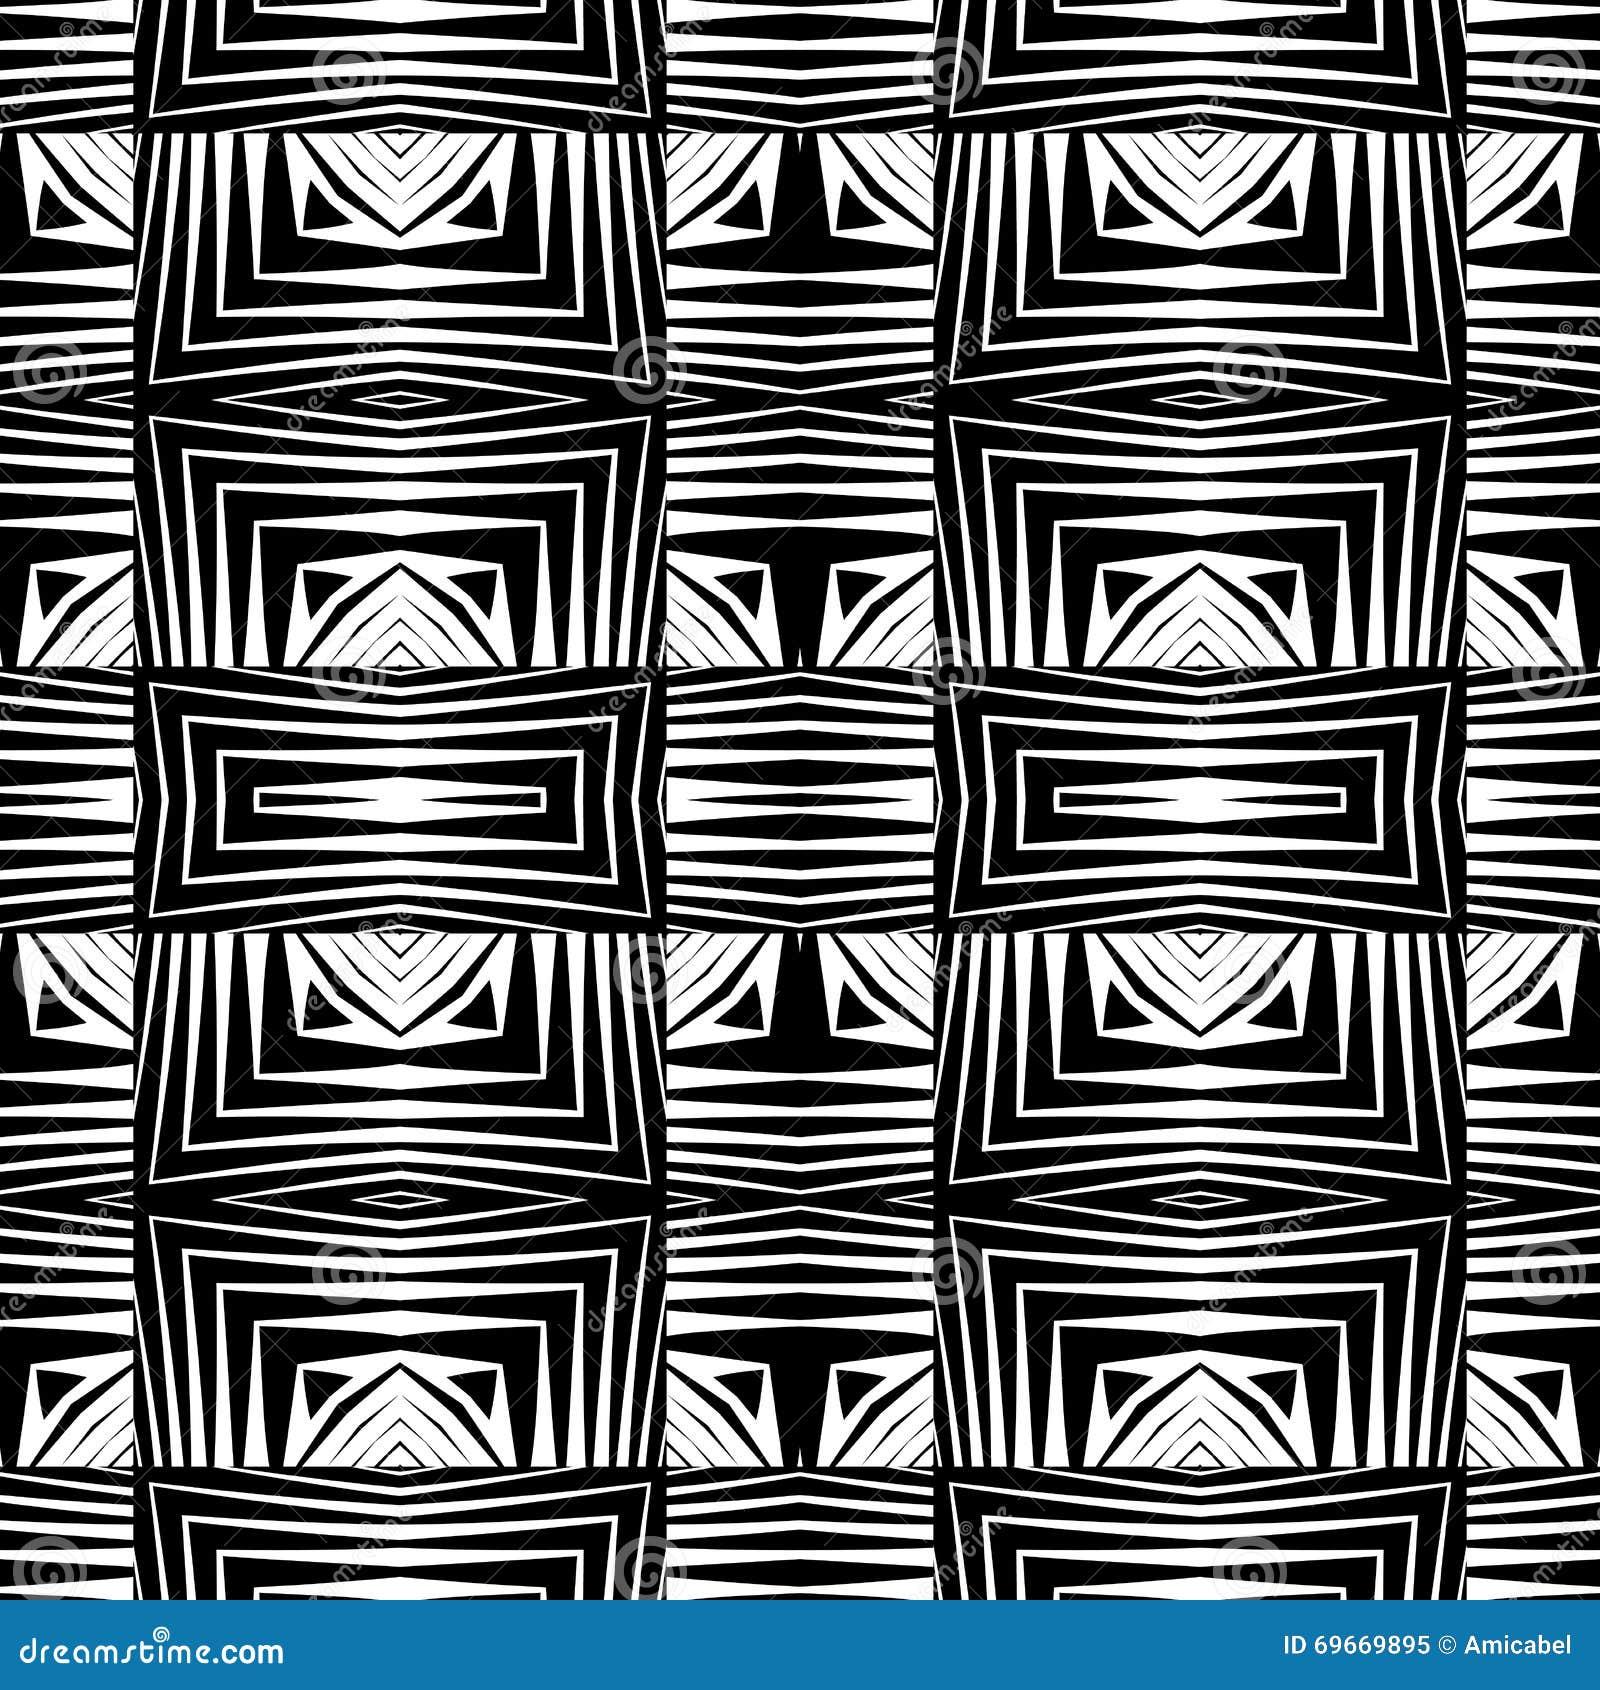 Design Seamless Monochrome Geometric Pattern Stock Vector